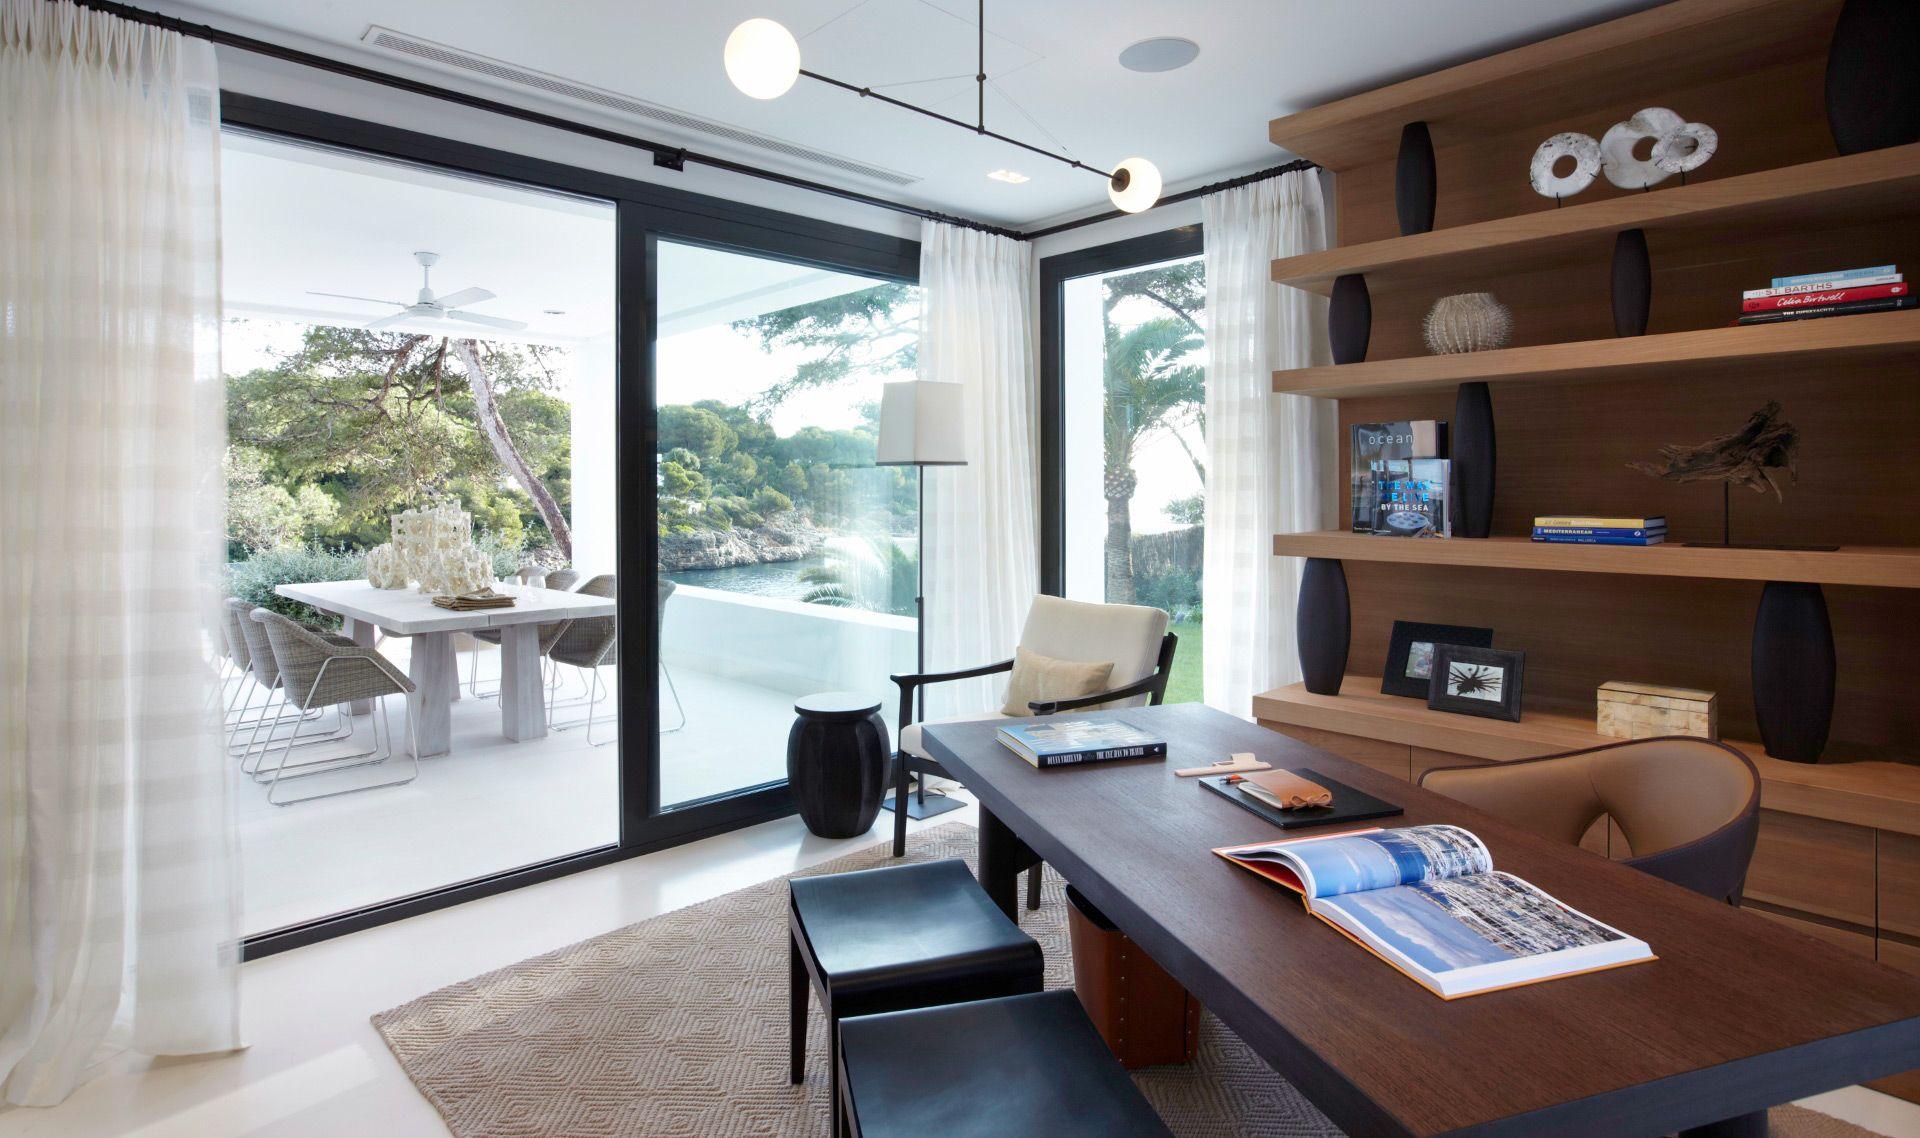 Private Residence, Beach House, Balearic Islands | Fiona Barratt ...